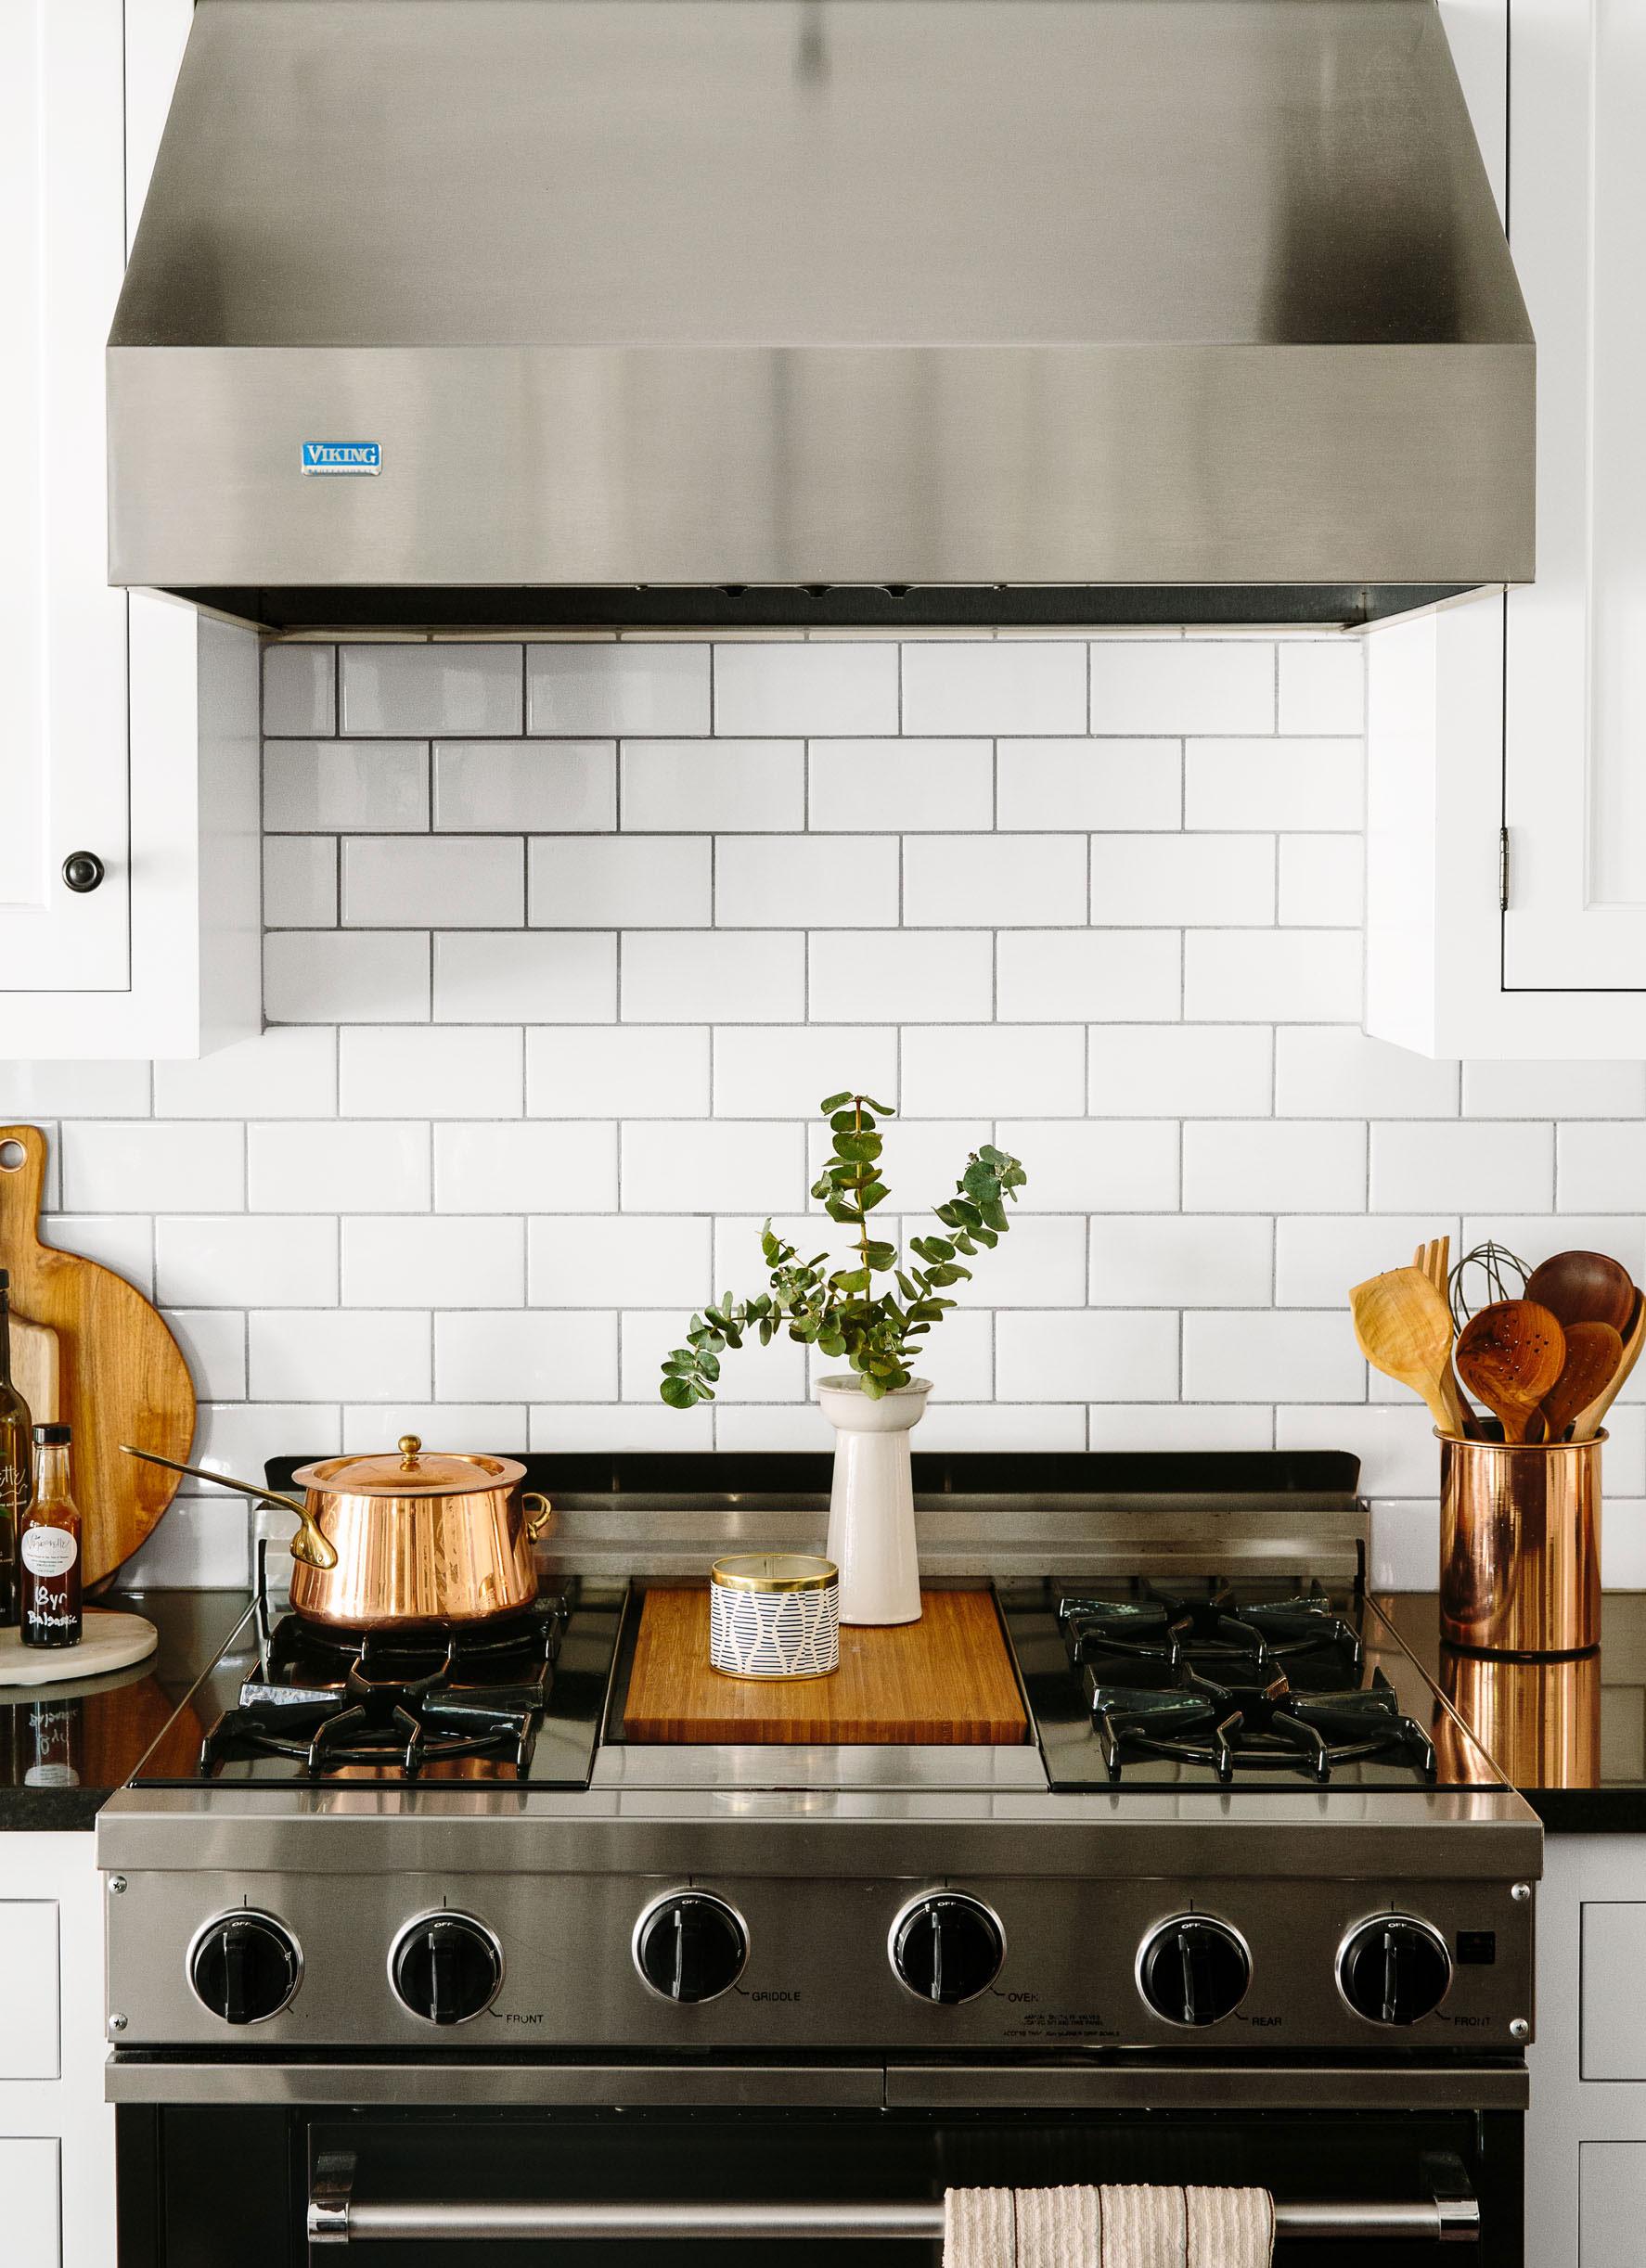 Kitchen Stovetop